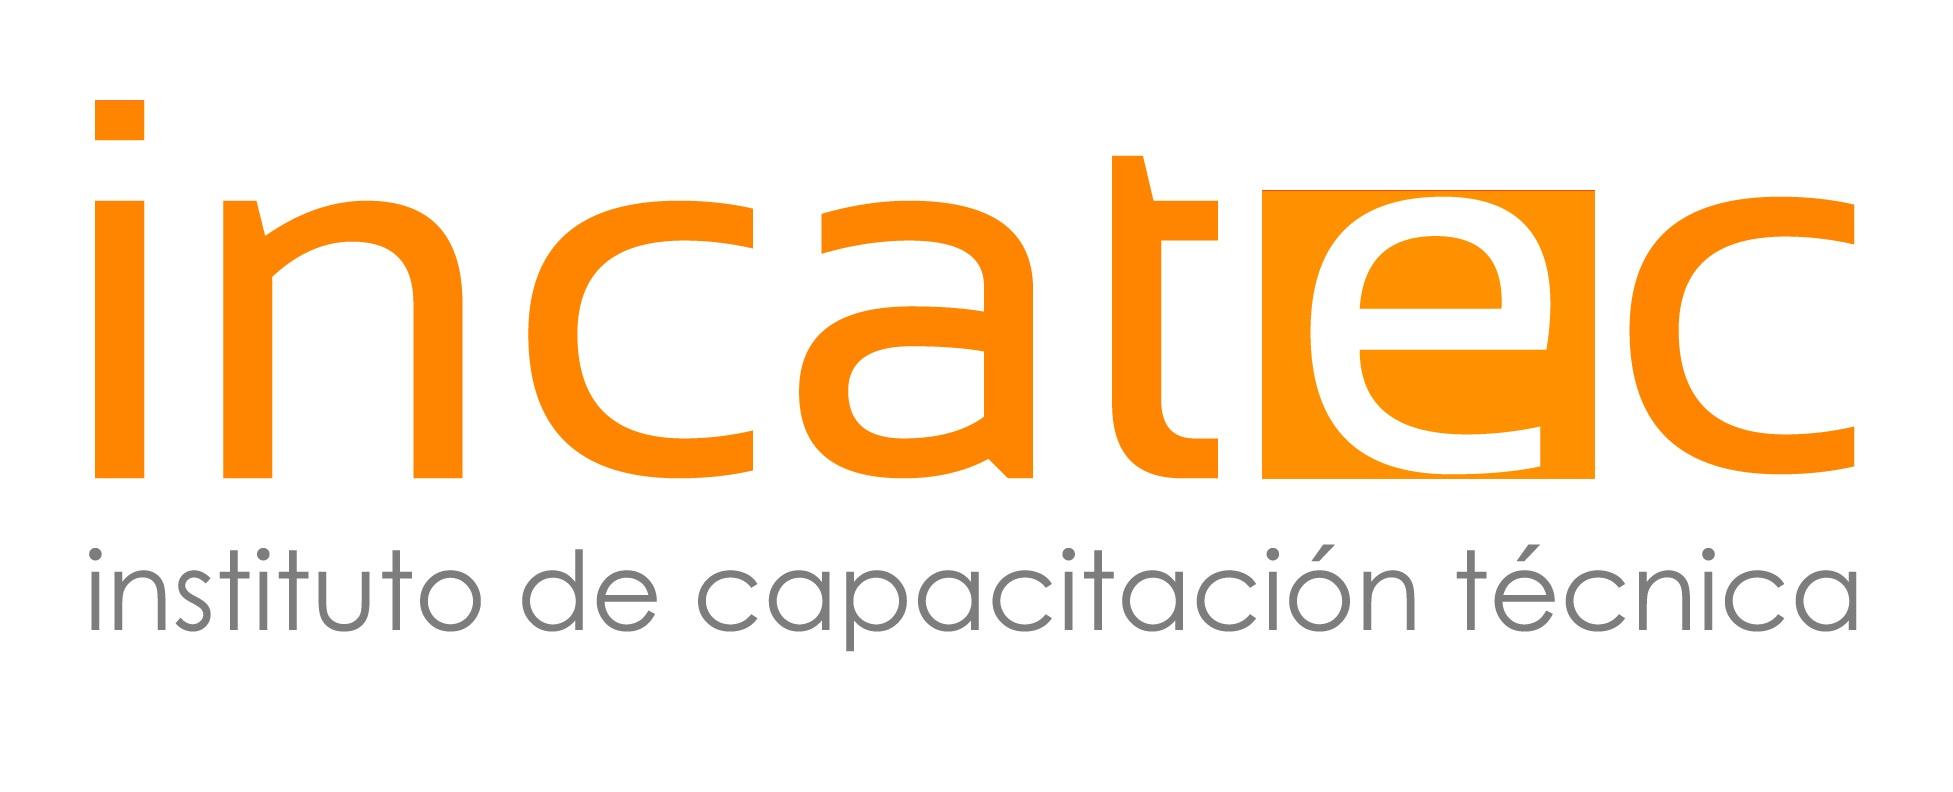 Logo Instituto de Capacitación Técnica Incatec Ltda.